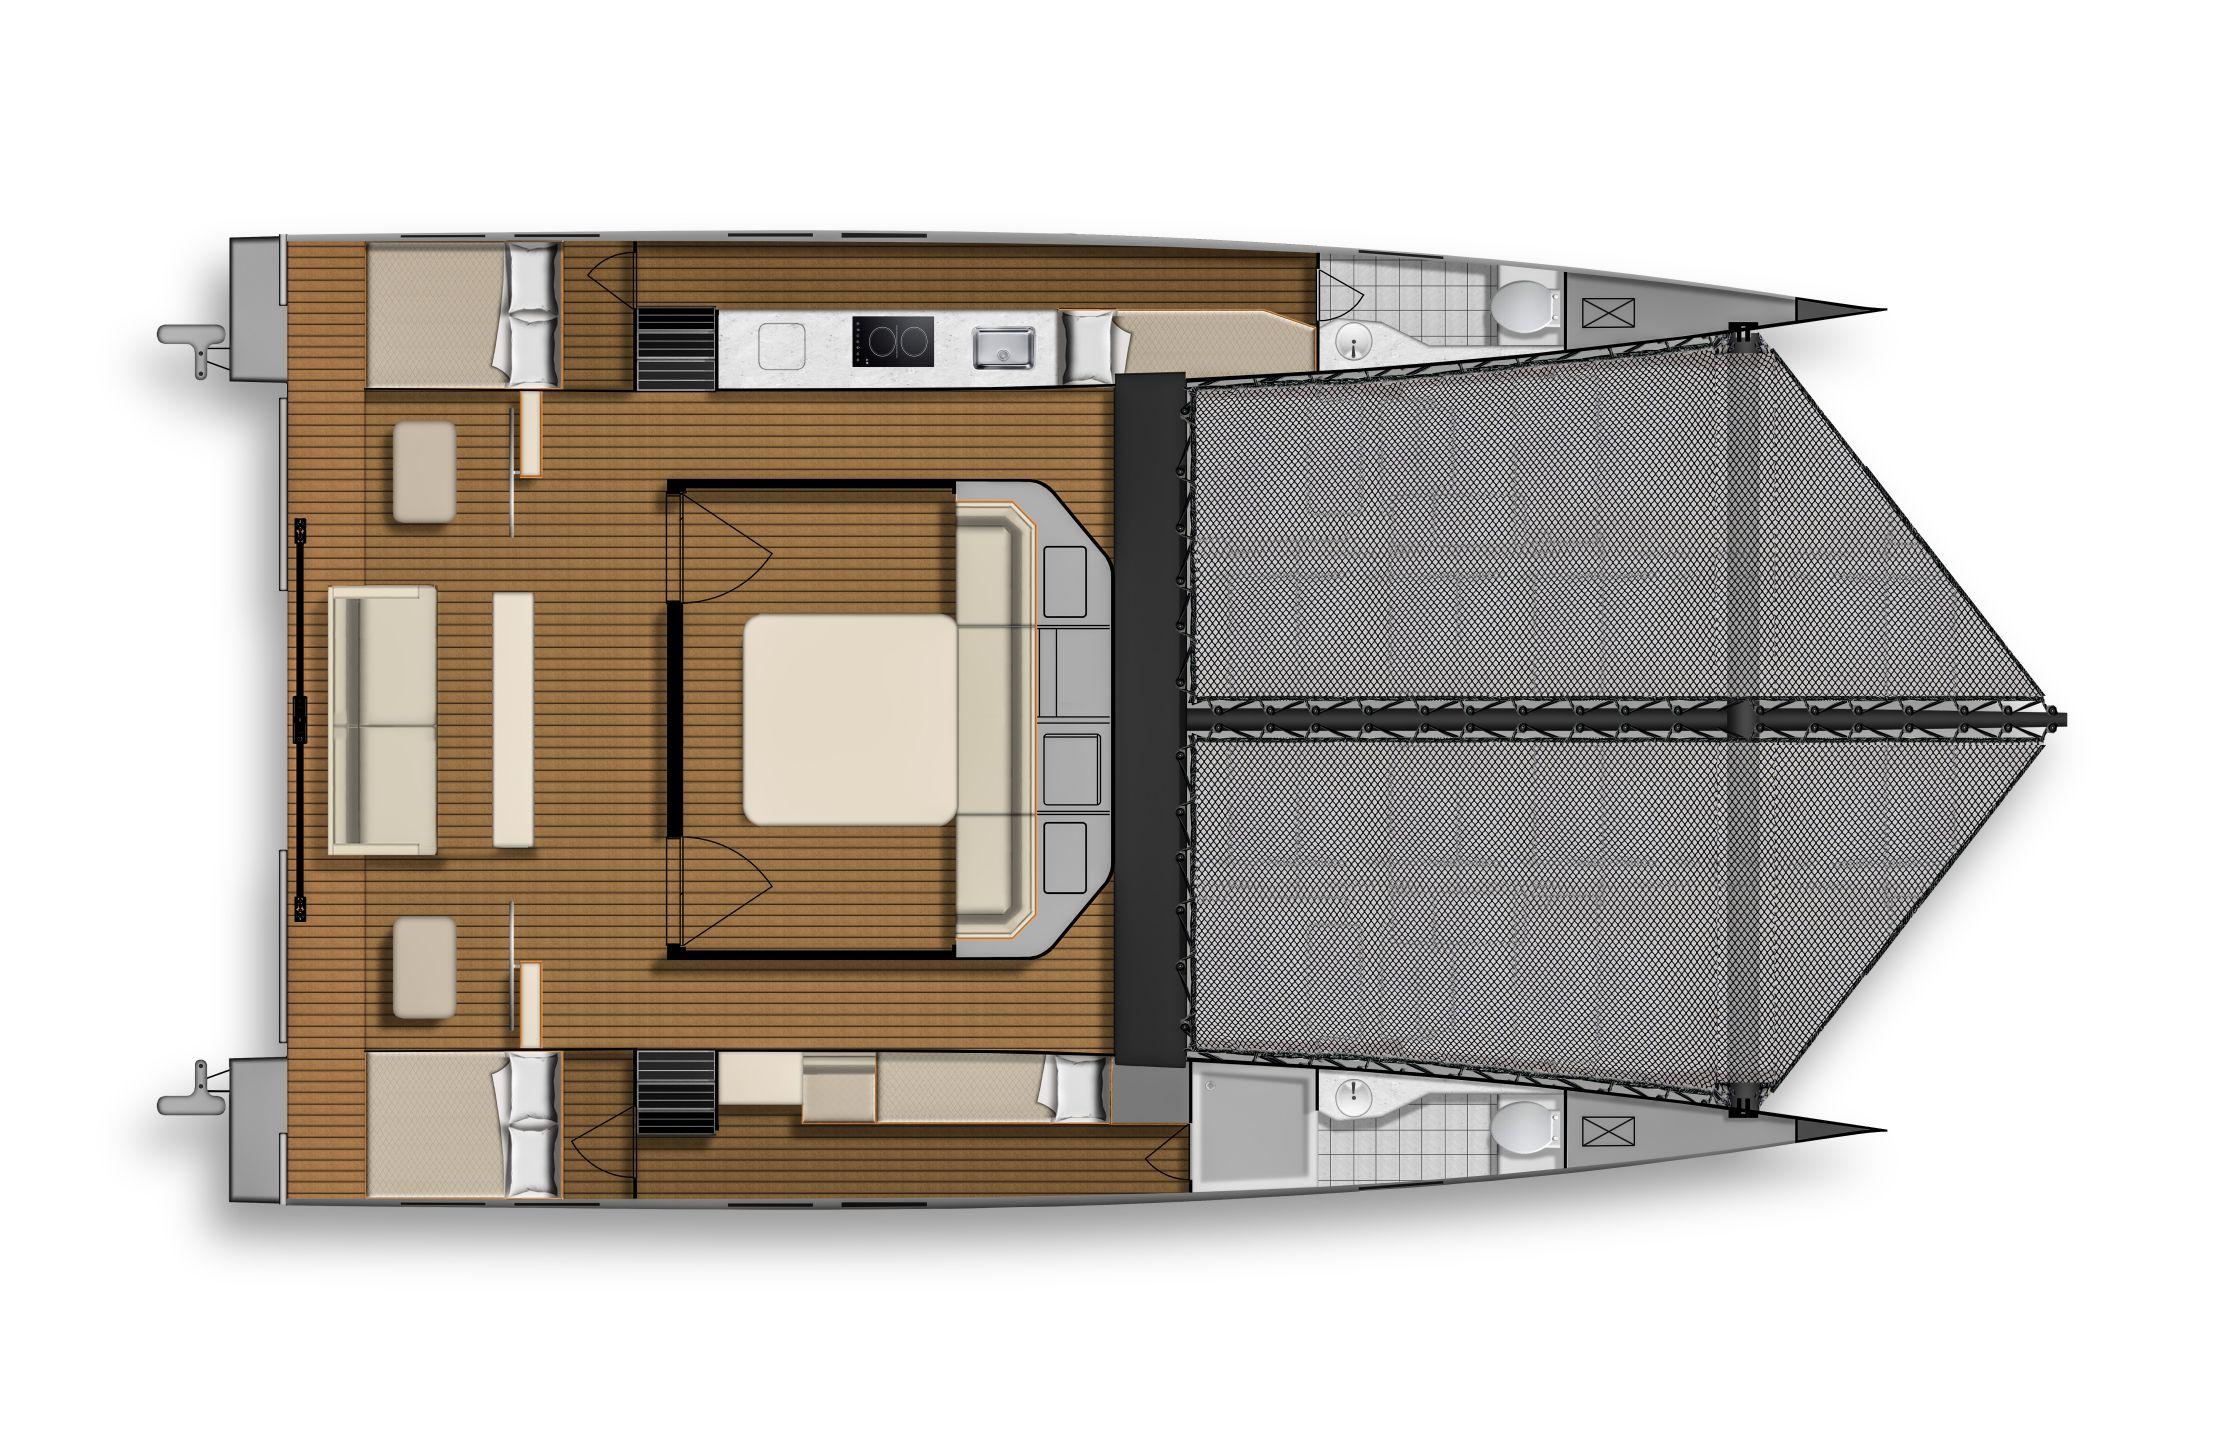 ESC40 Interior Layout Main Cabin Table